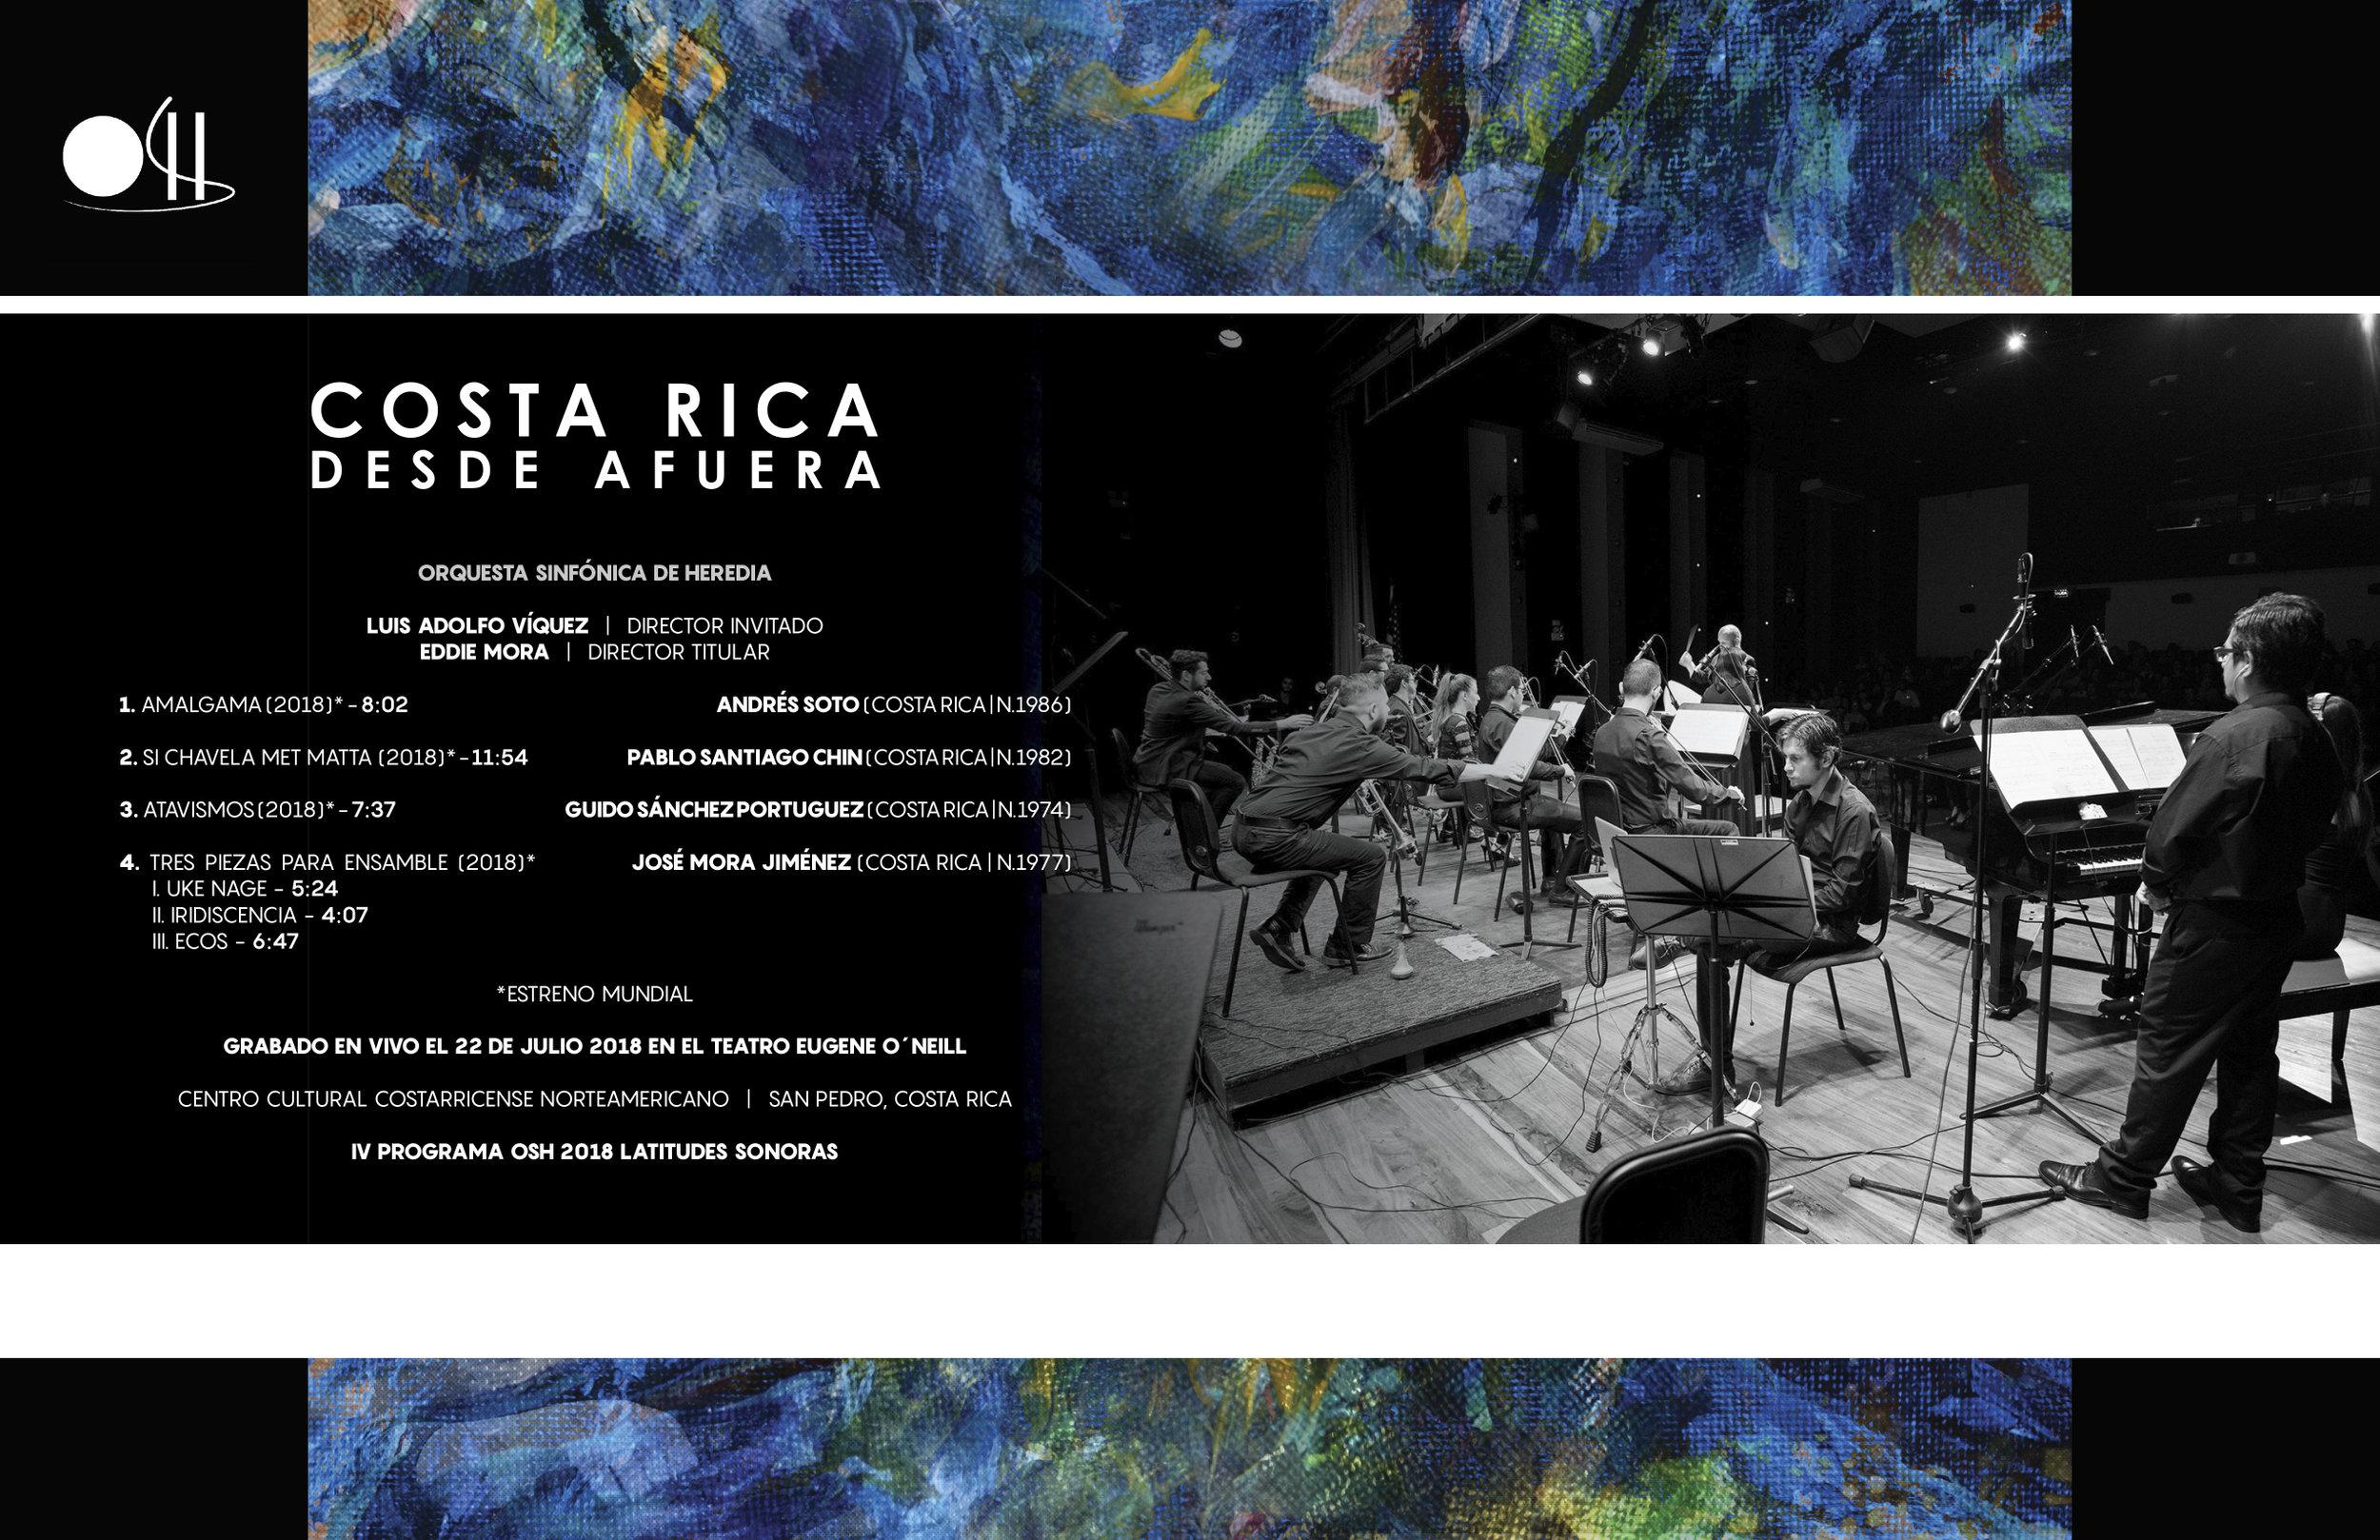 CRDA Final 3 - Digital Release Art2.jpg